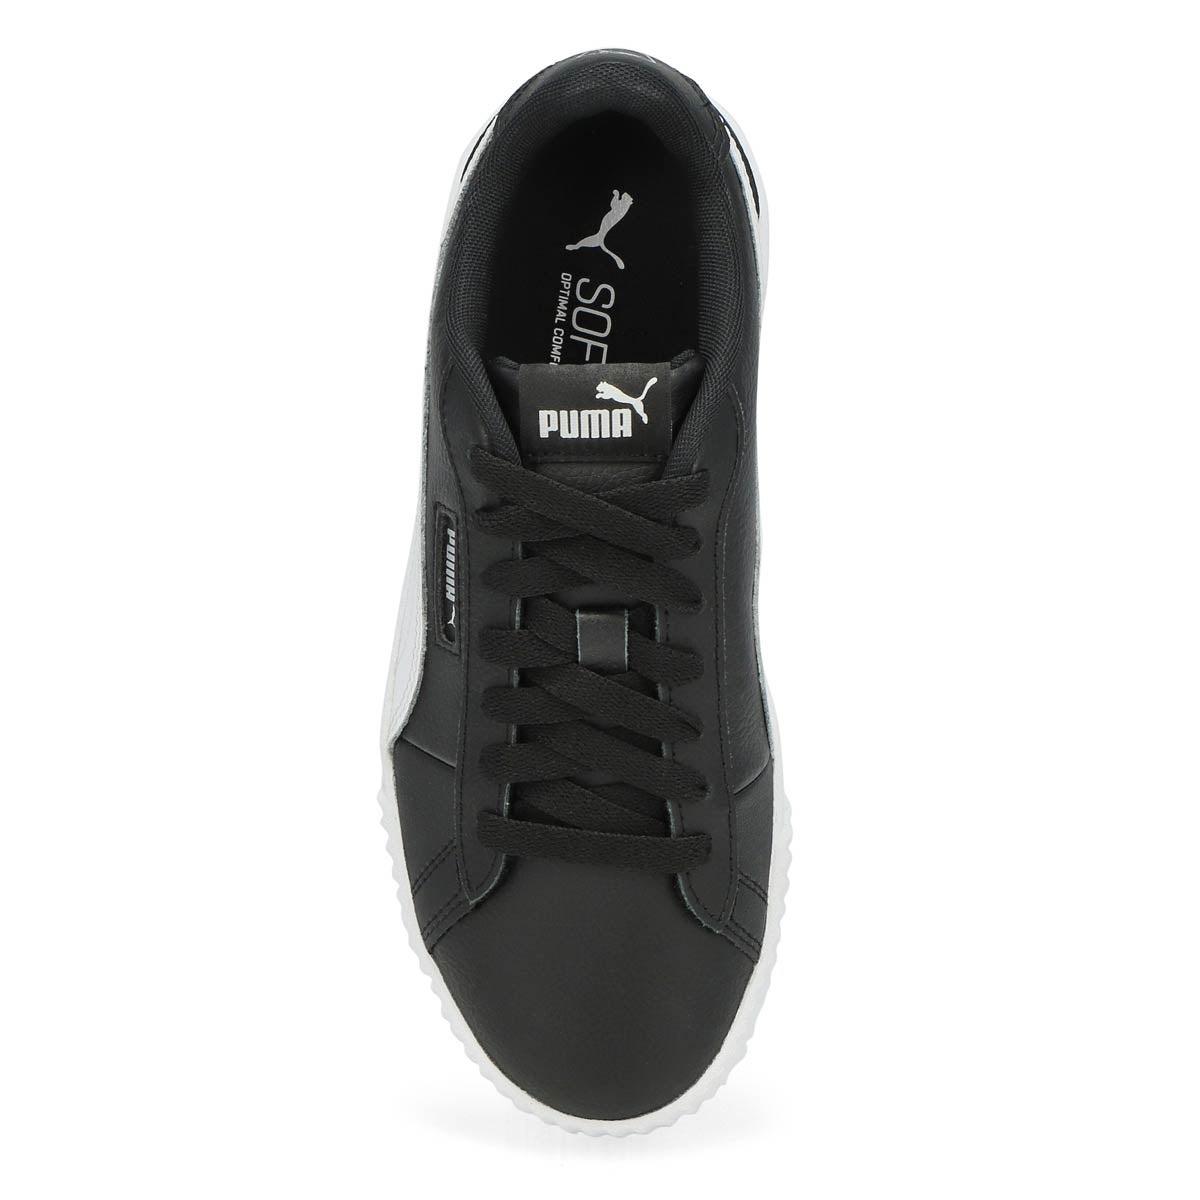 Women's Carina Crew lace up sneaker -  Black/White